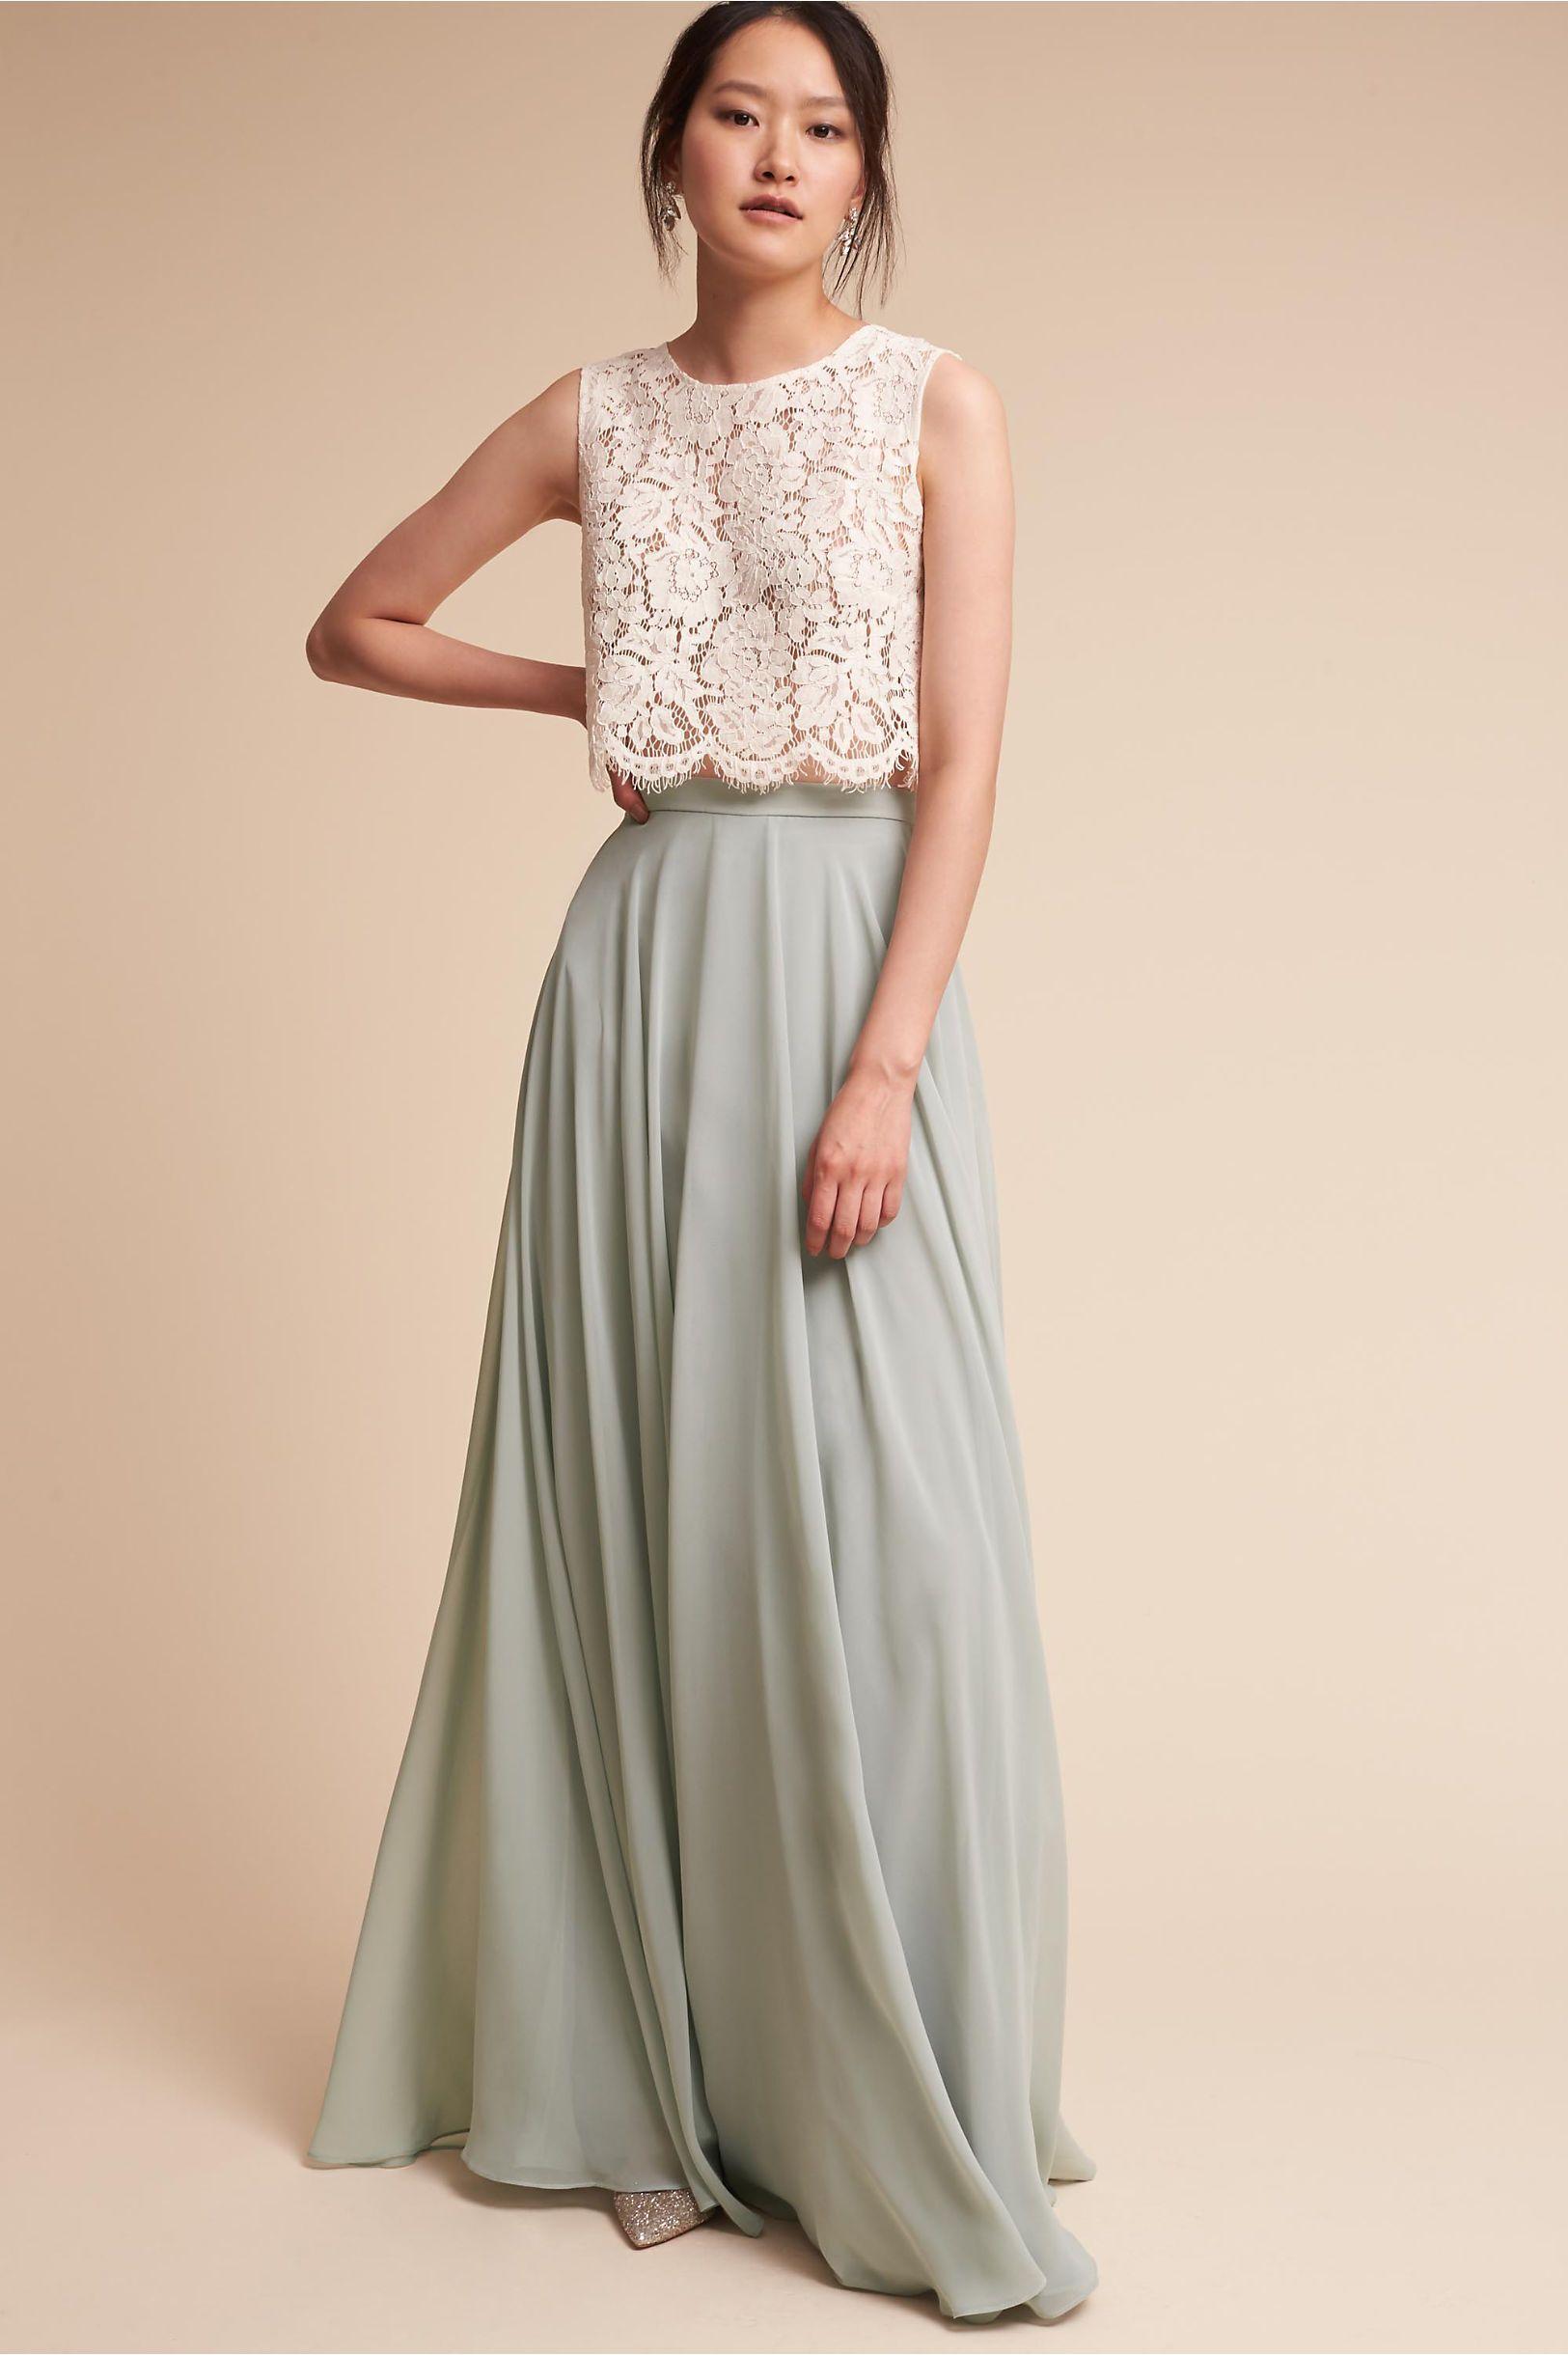 0c9459dda37 BHLDN Allegro Top   Hampton Skirt in Bridal Party